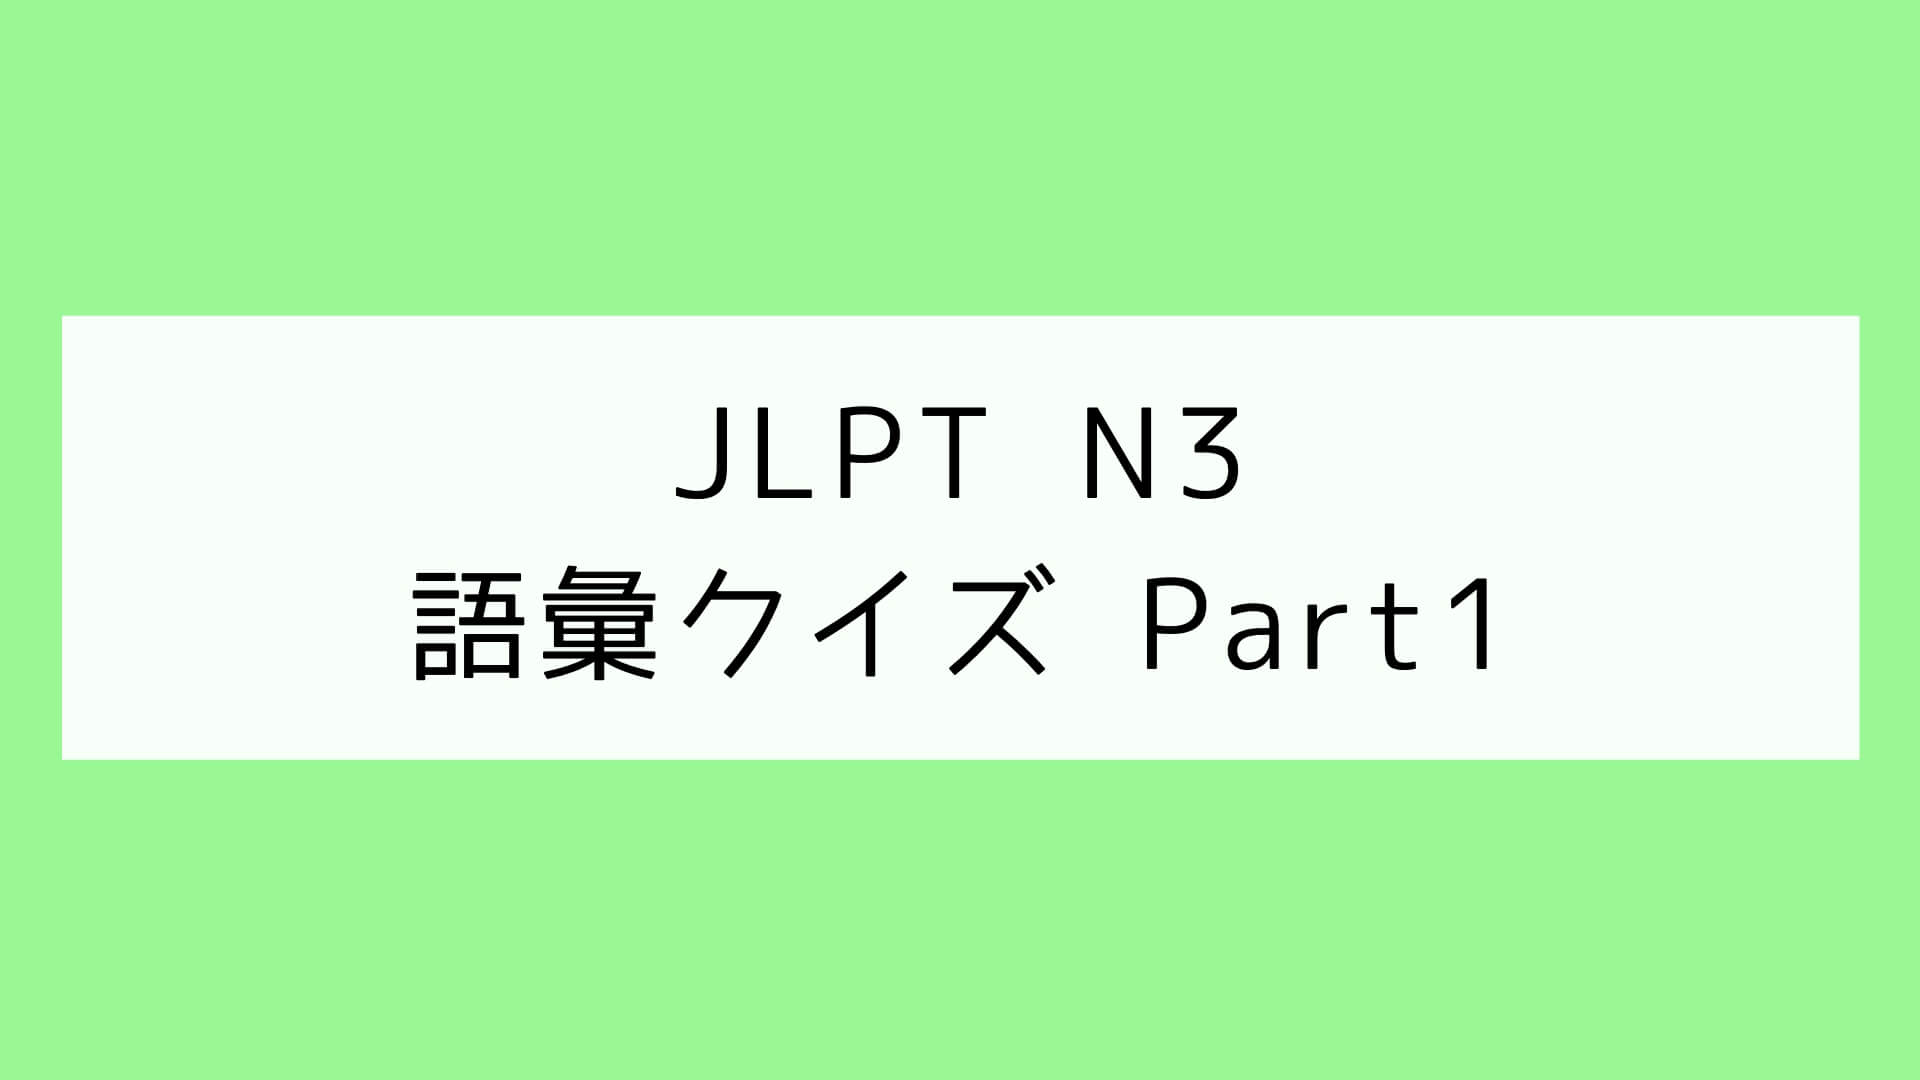 【JLPT N3】語彙クイズ Part1